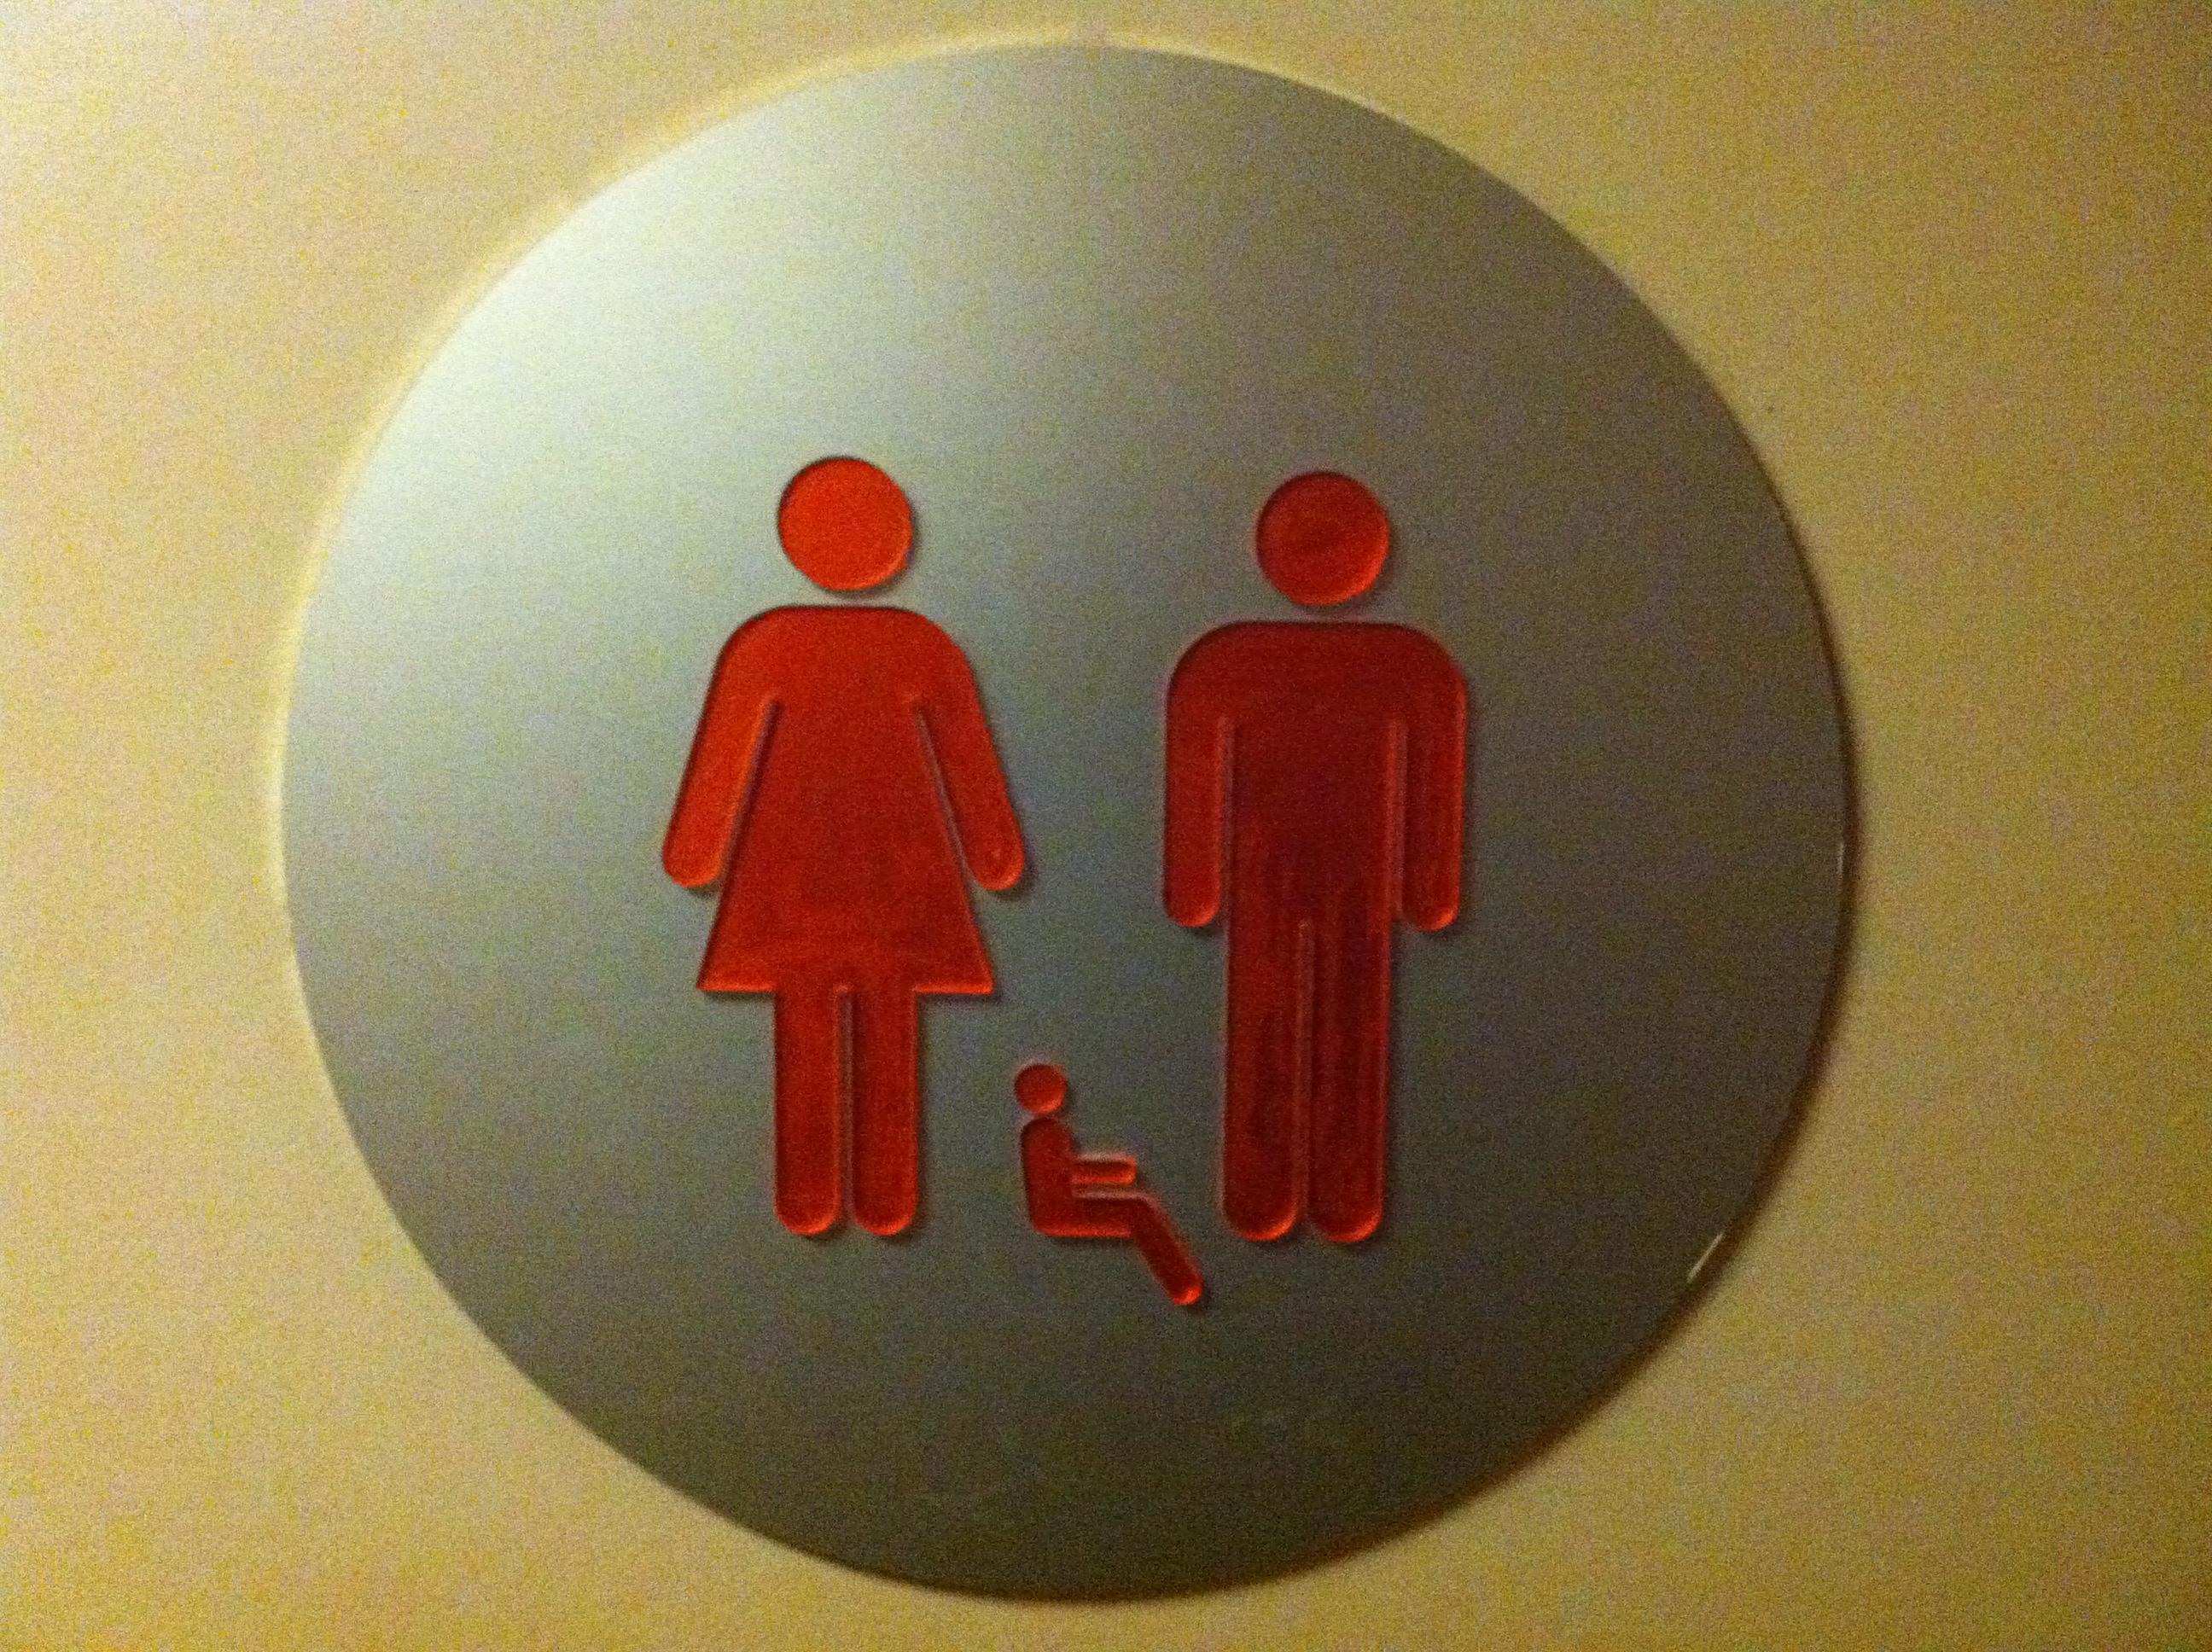 Weird bathroom signs - Weird Bathroom Signs 49